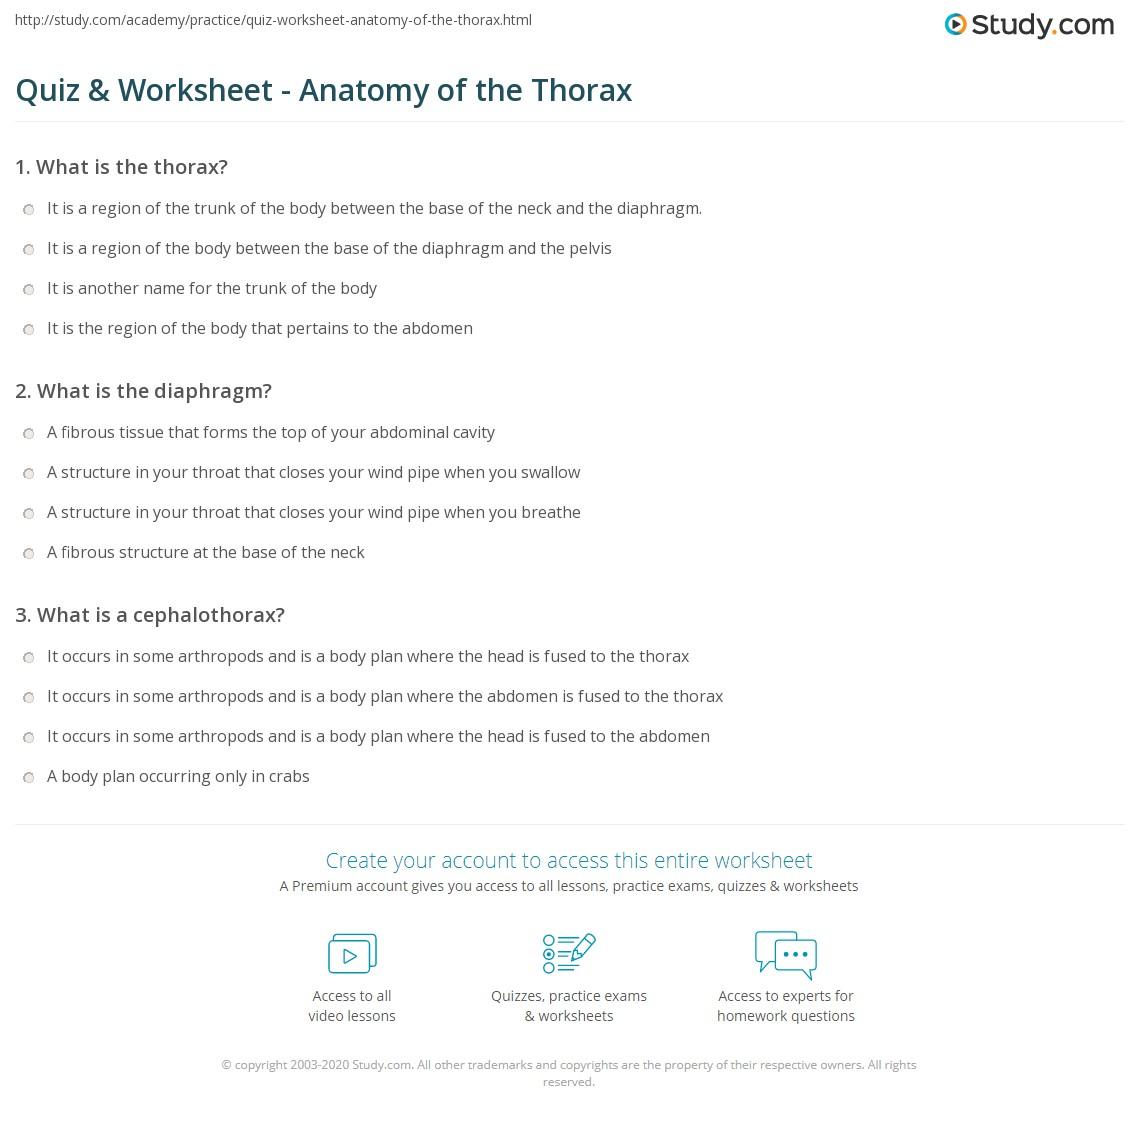 Quiz & Worksheet - Anatomy of the Thorax | Study.com